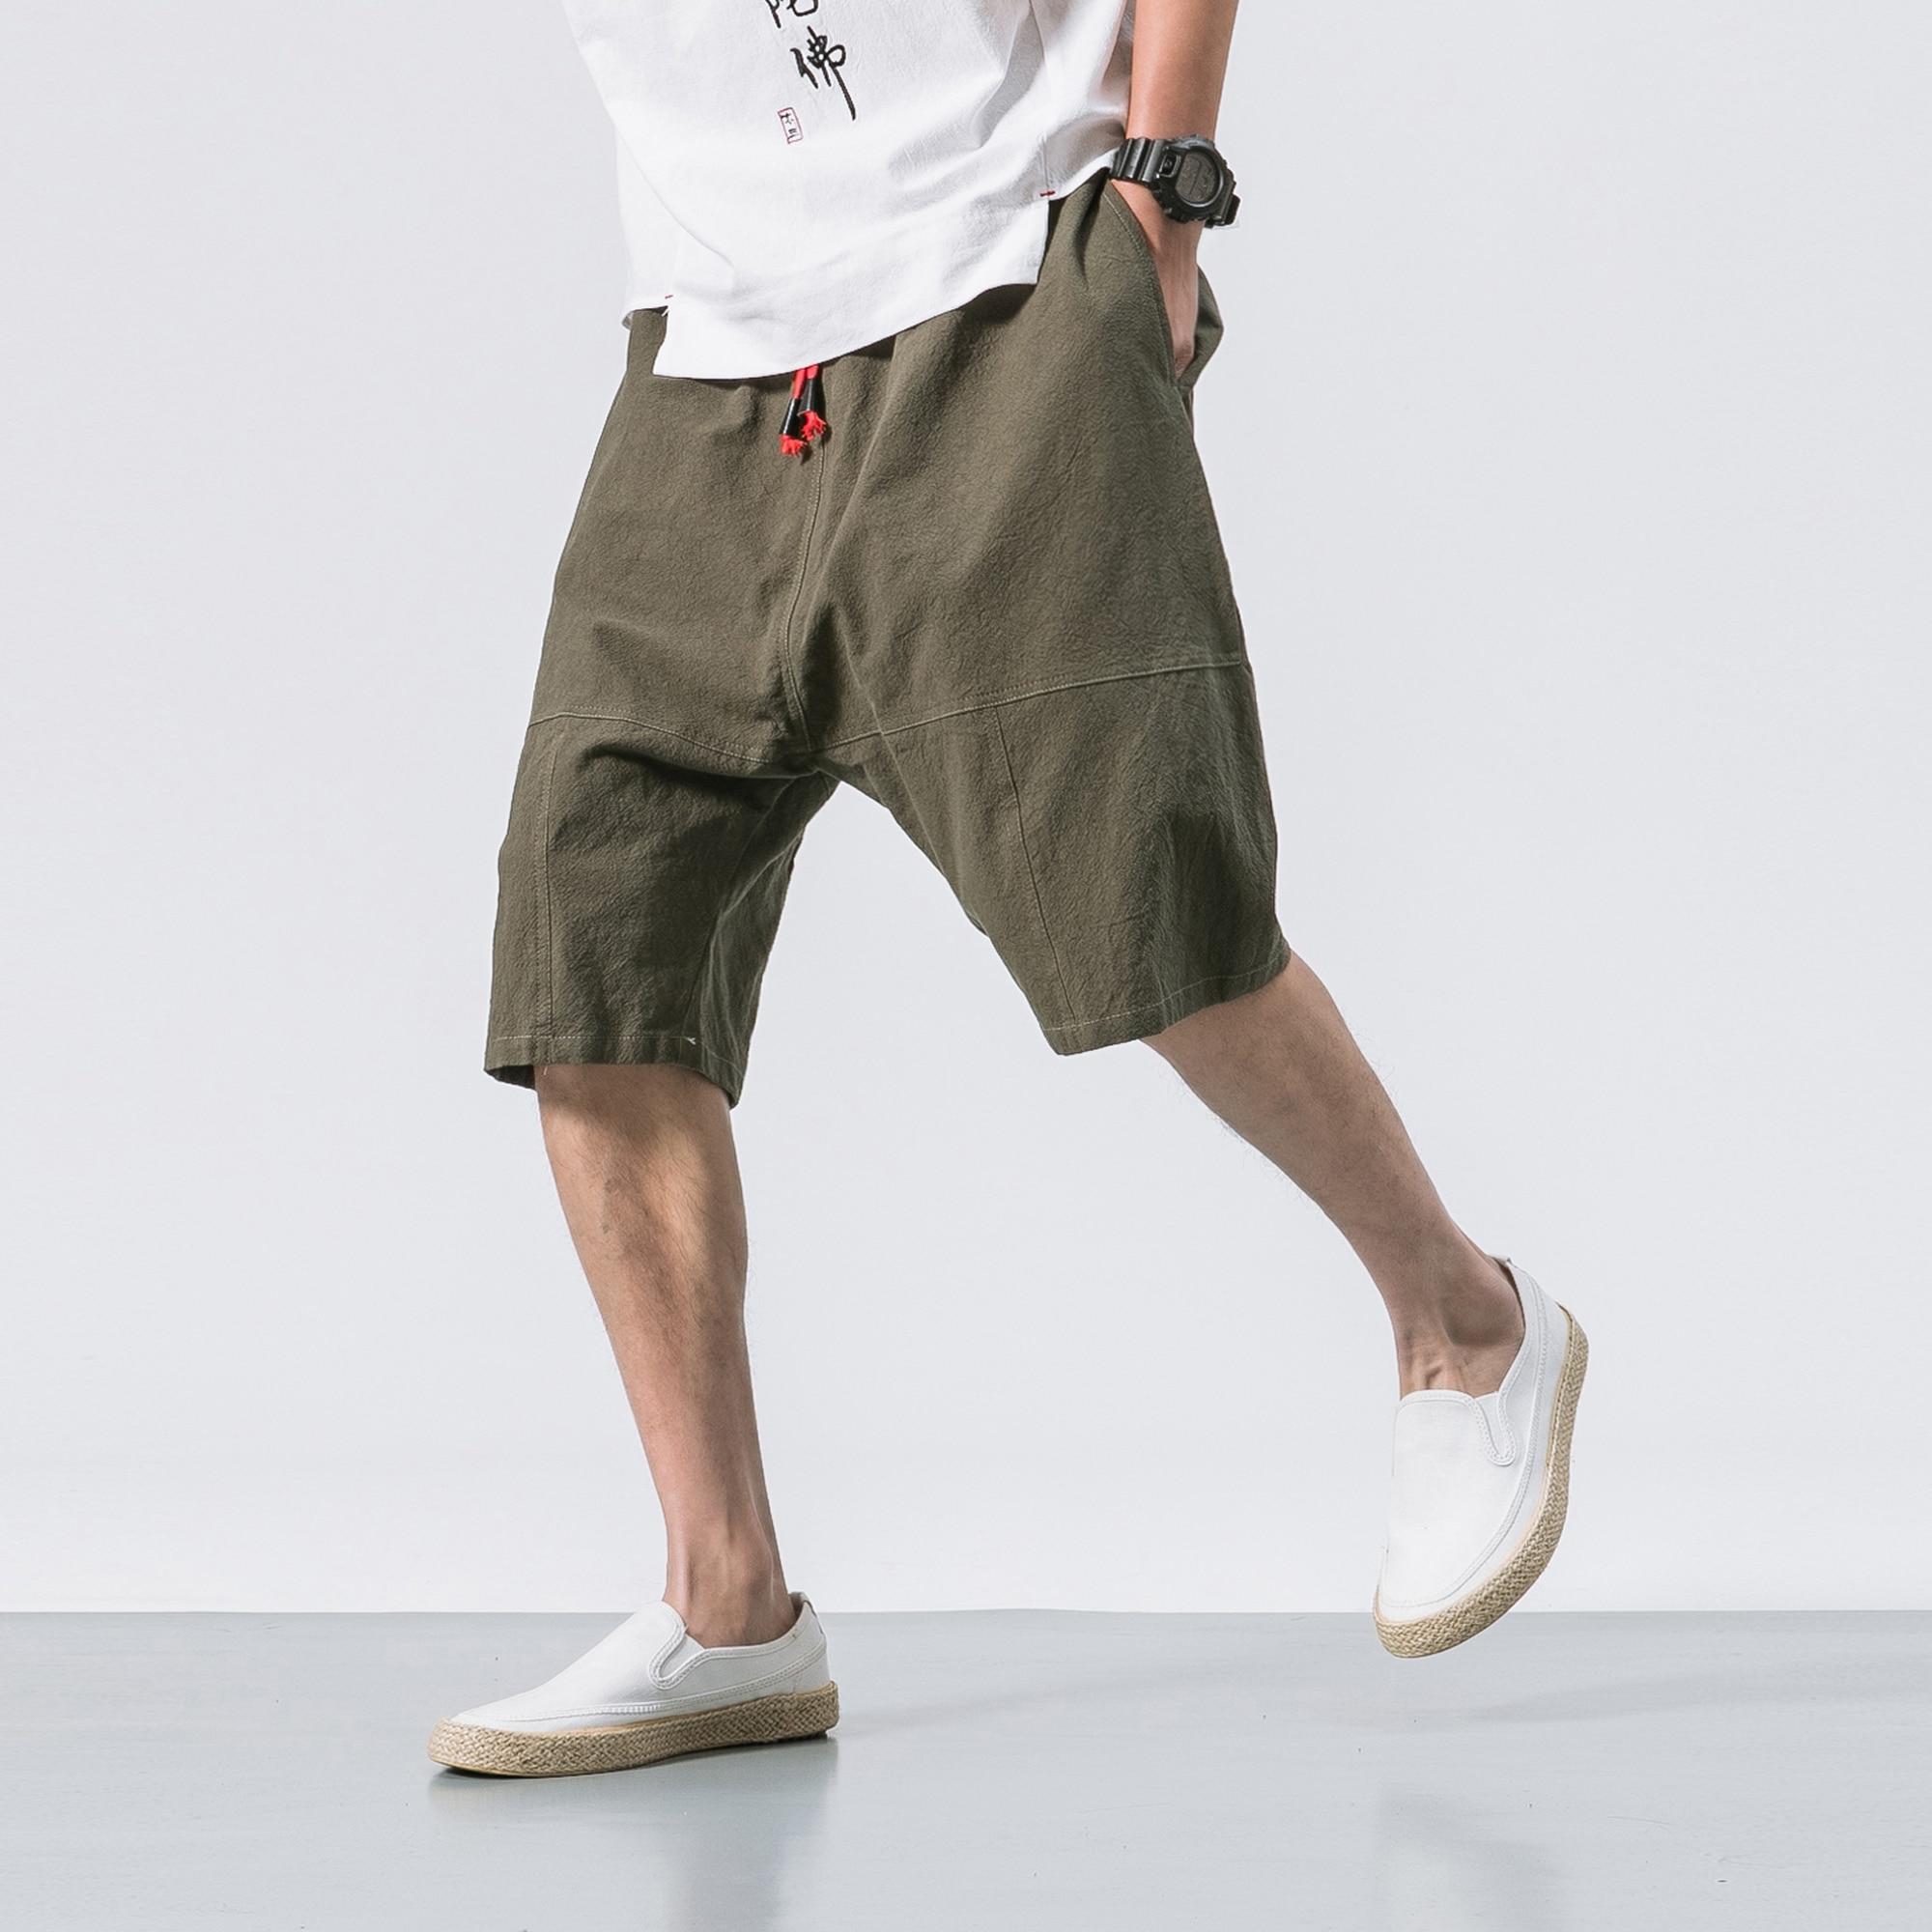 Men's Breathable Calf Length Elastic Waist Shorts BOTTOMS Men's Clothing & Accessories Shorts